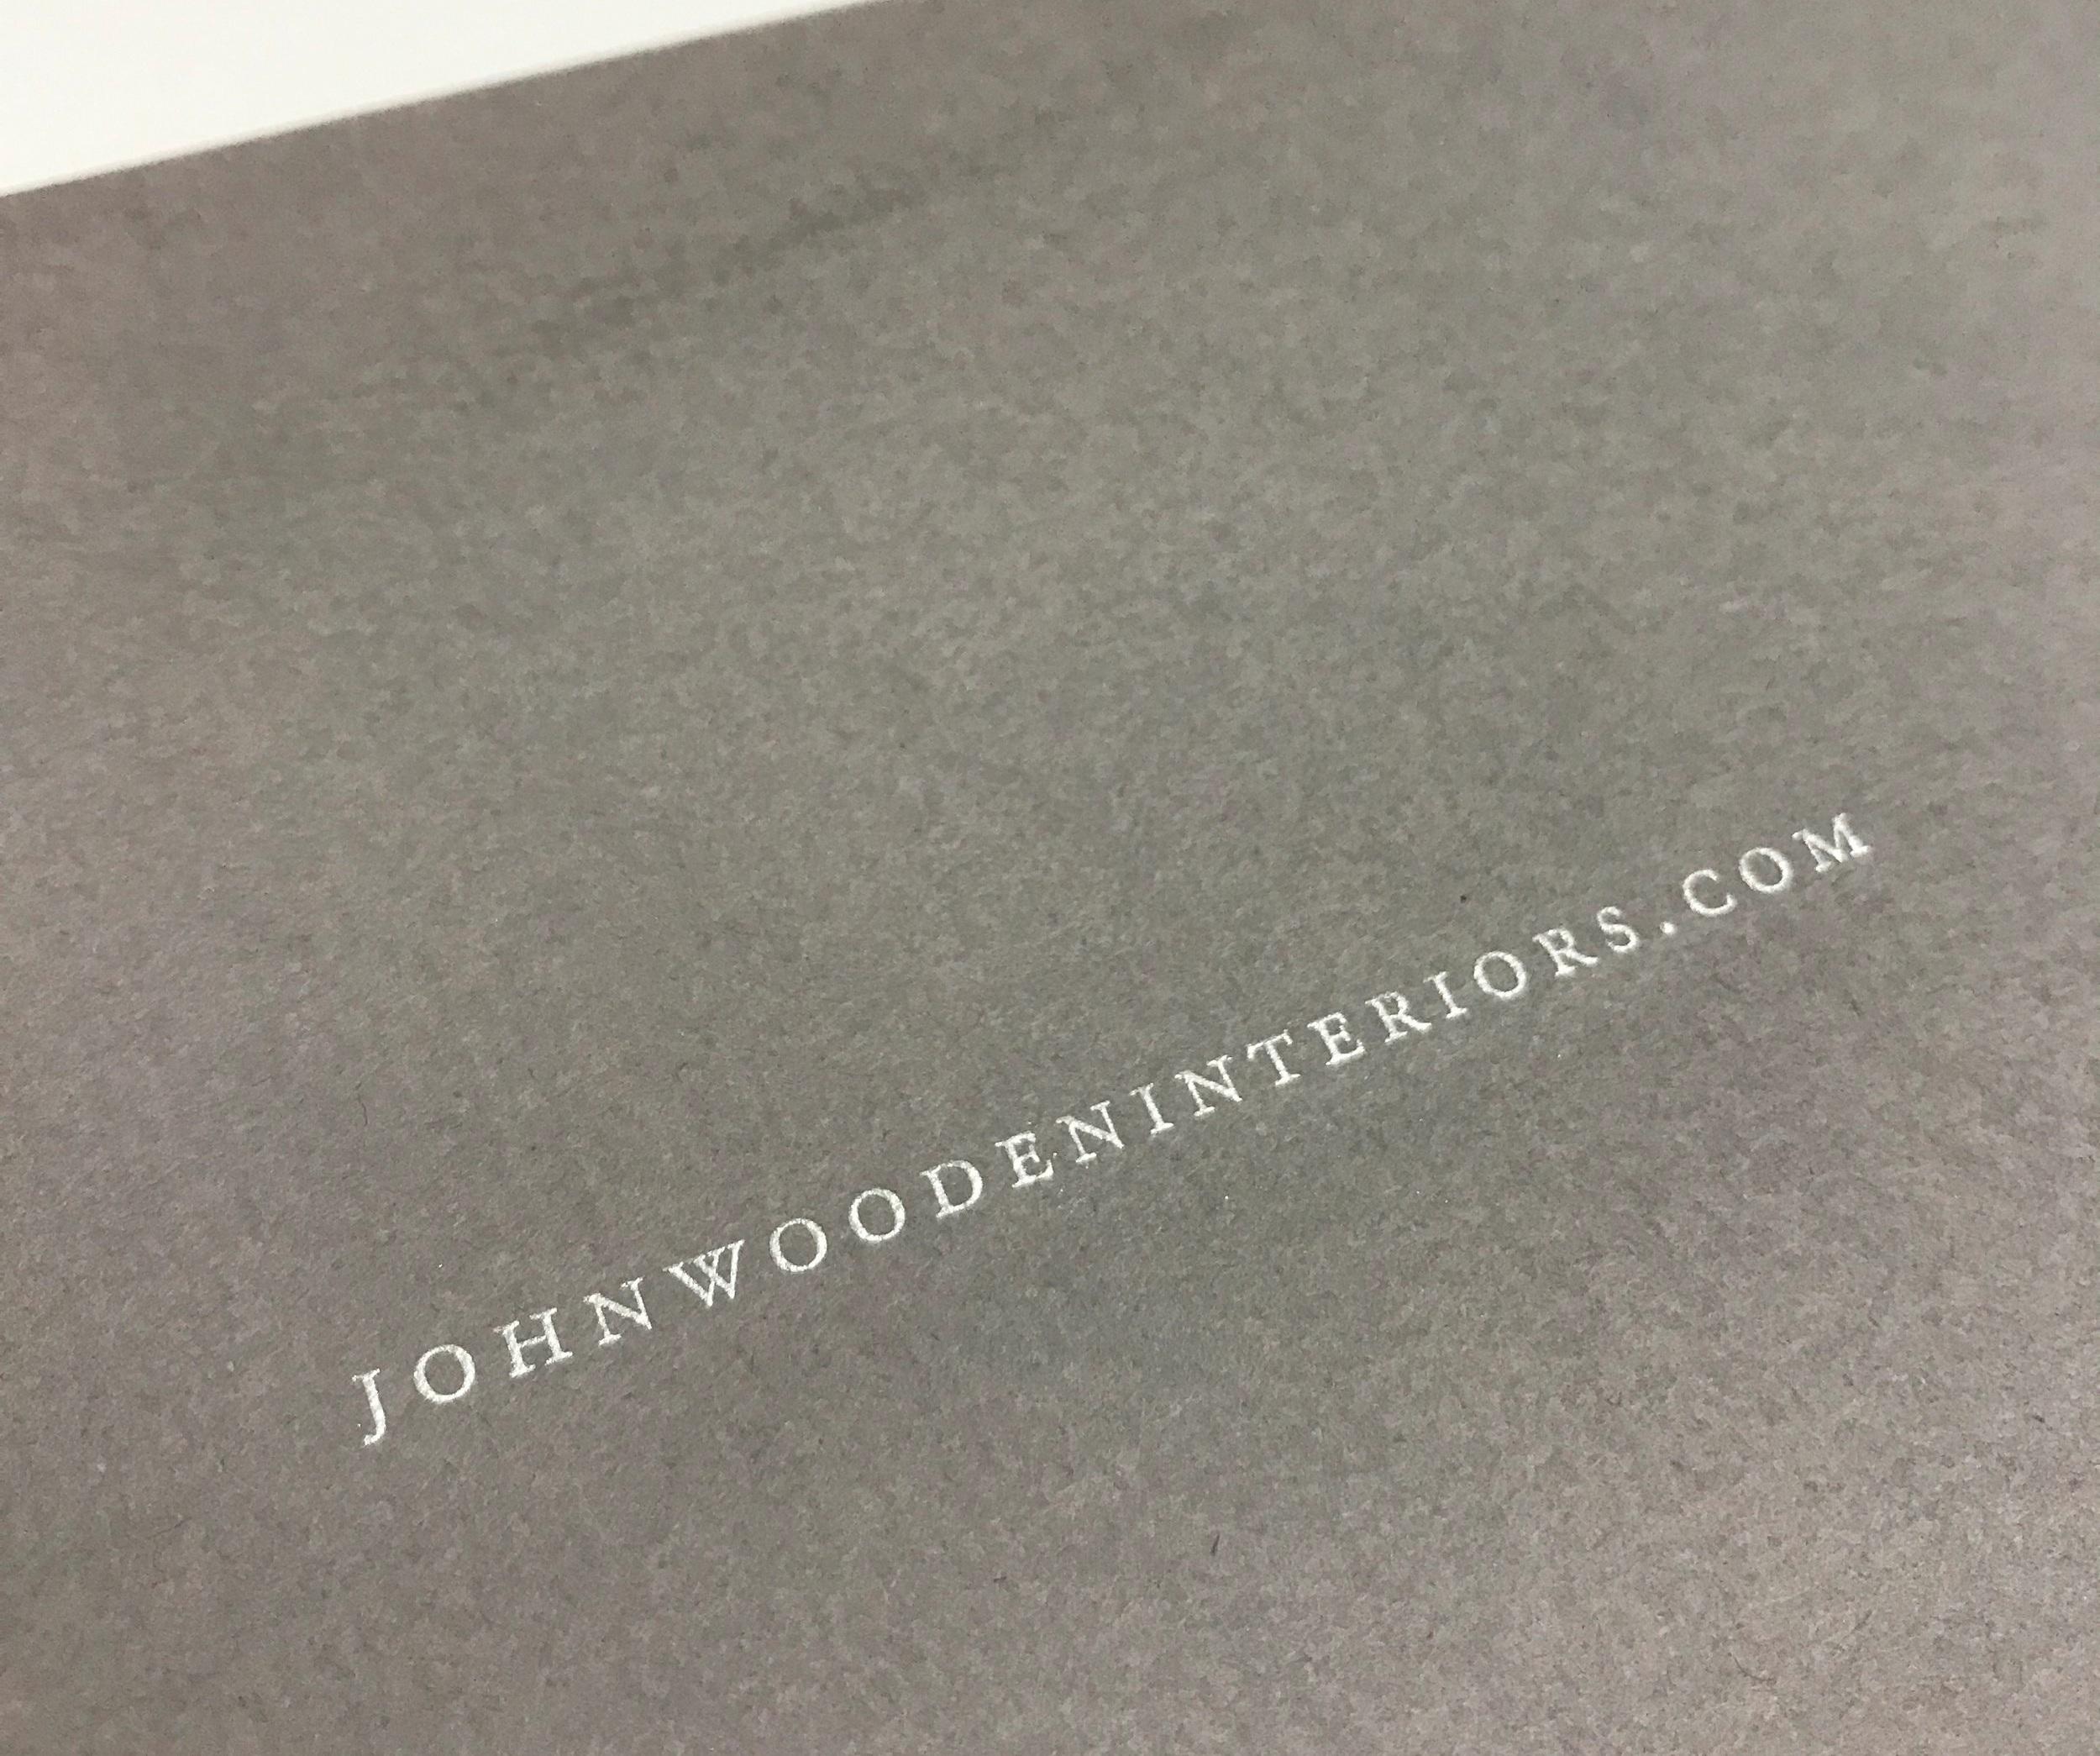 Corporate greeting card printed in Minneapolis by Anderberg Print